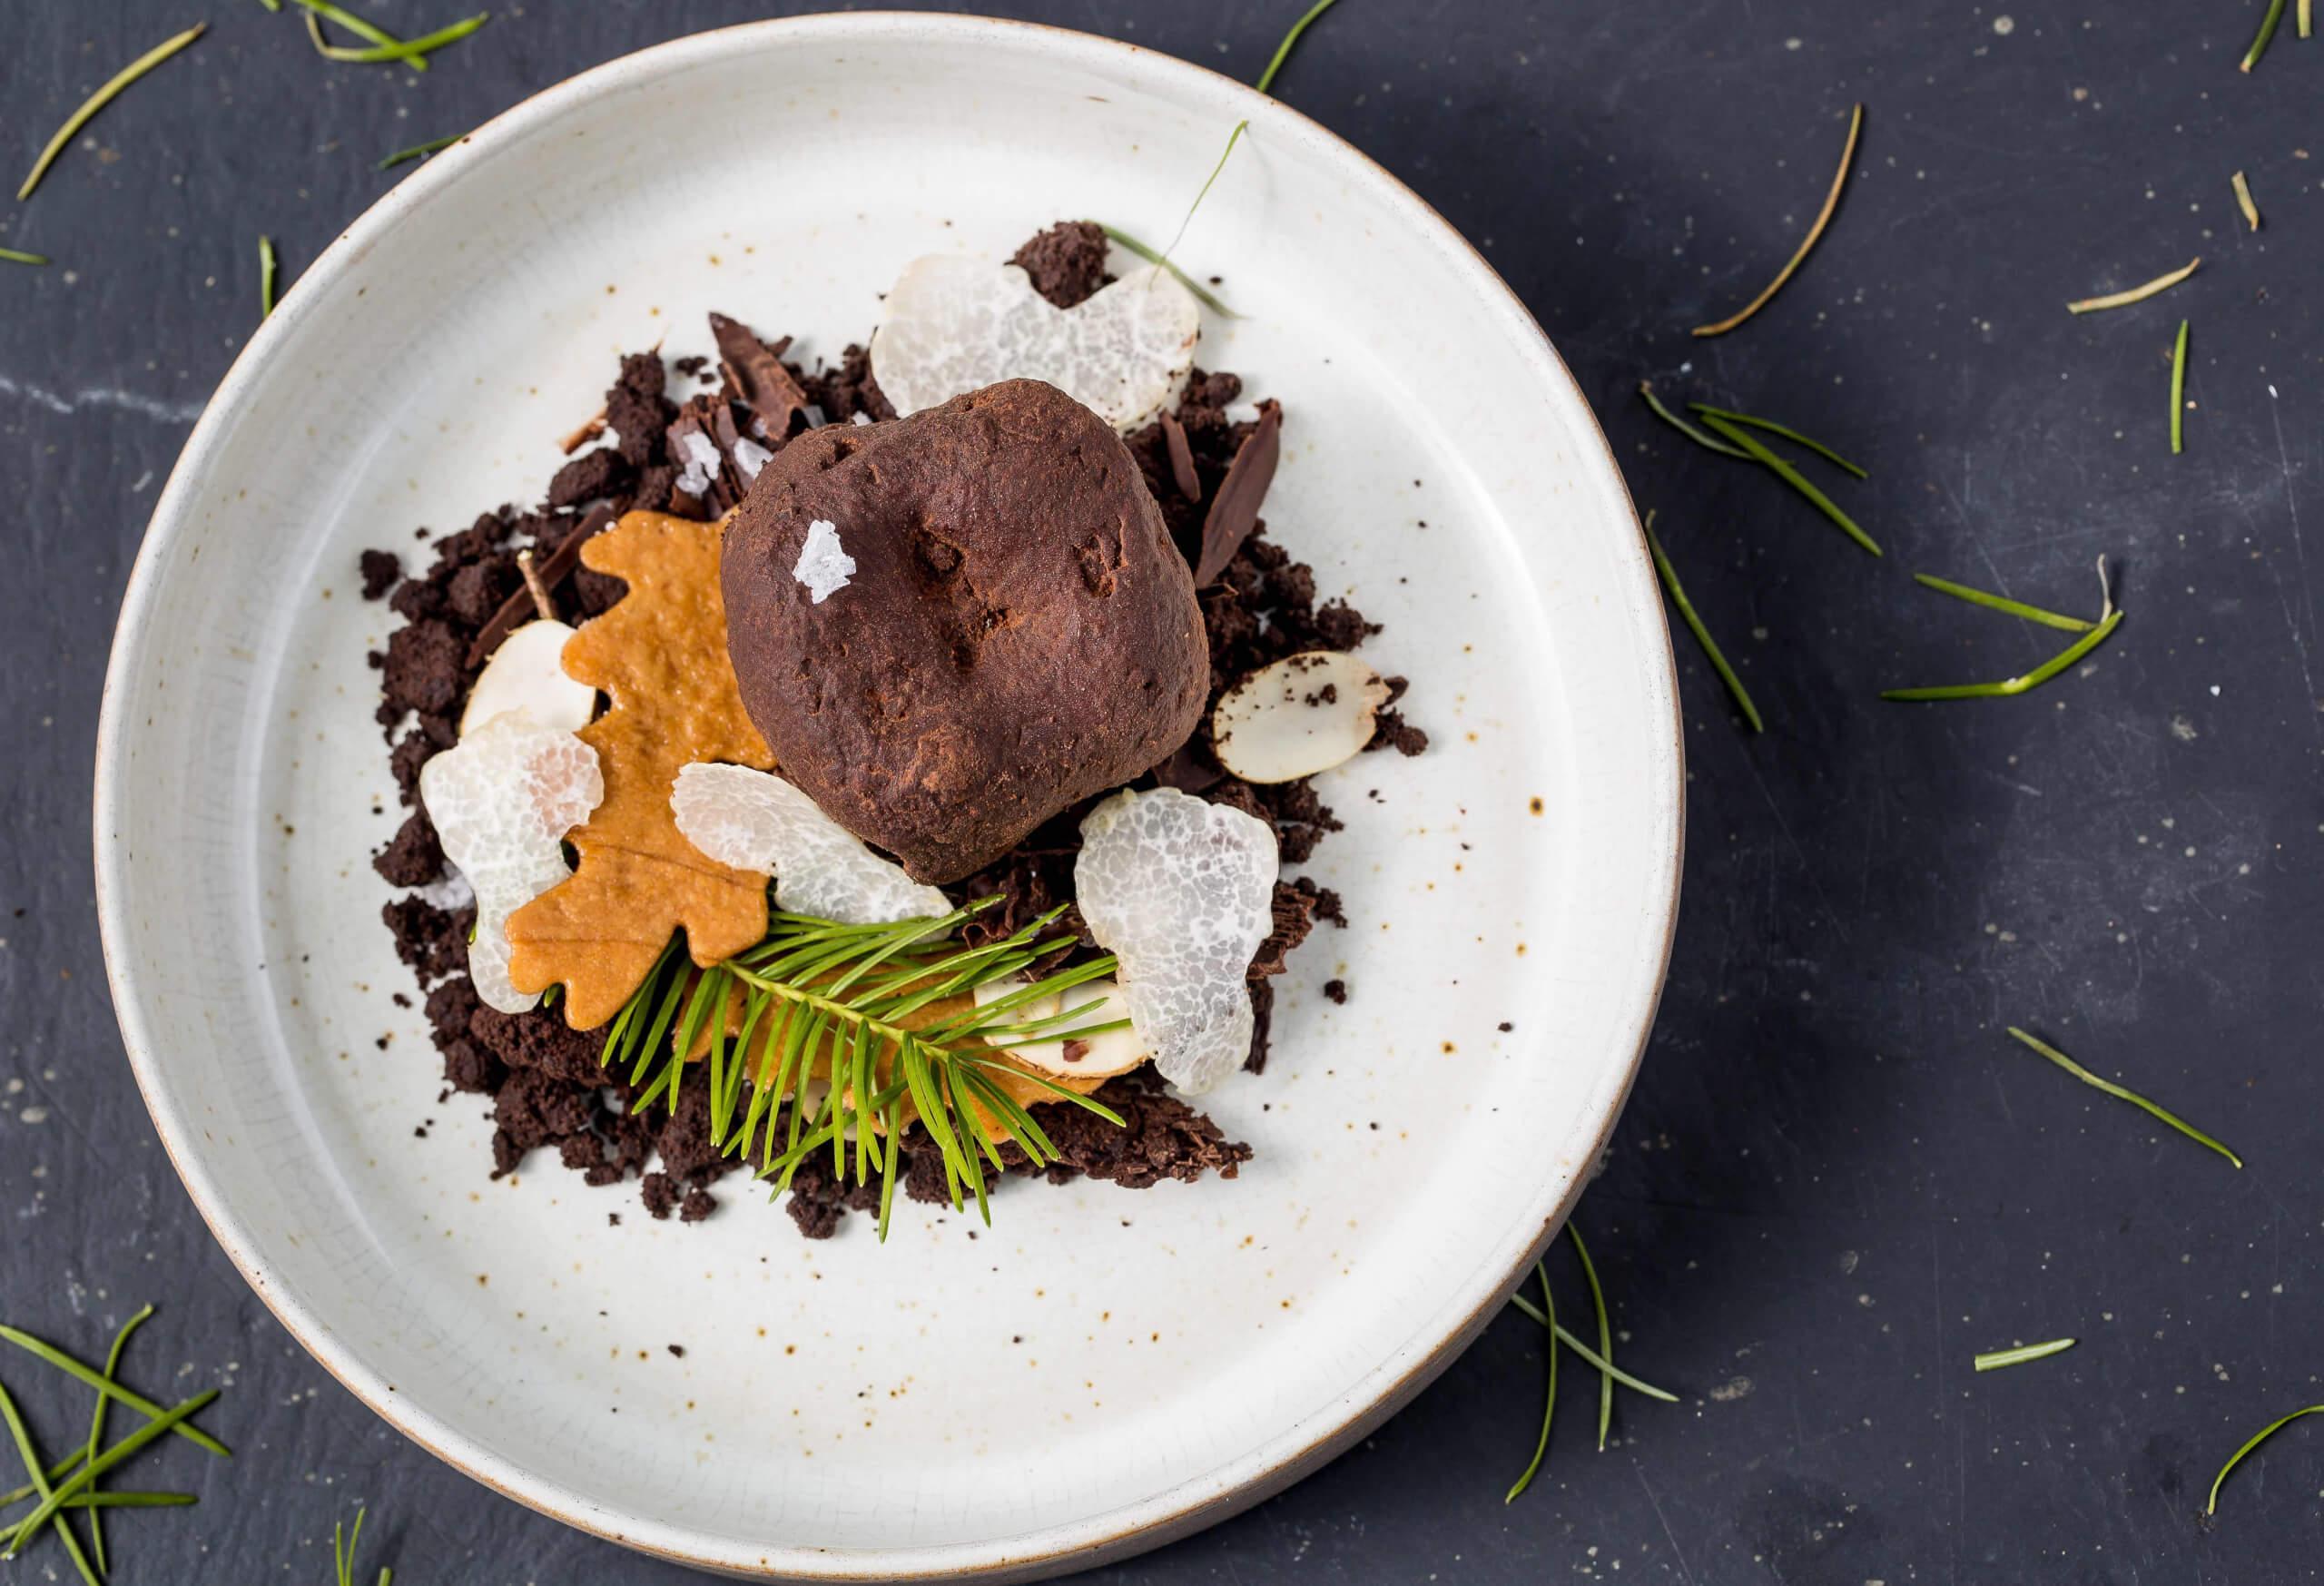 maze chocolate truffle dessert copy